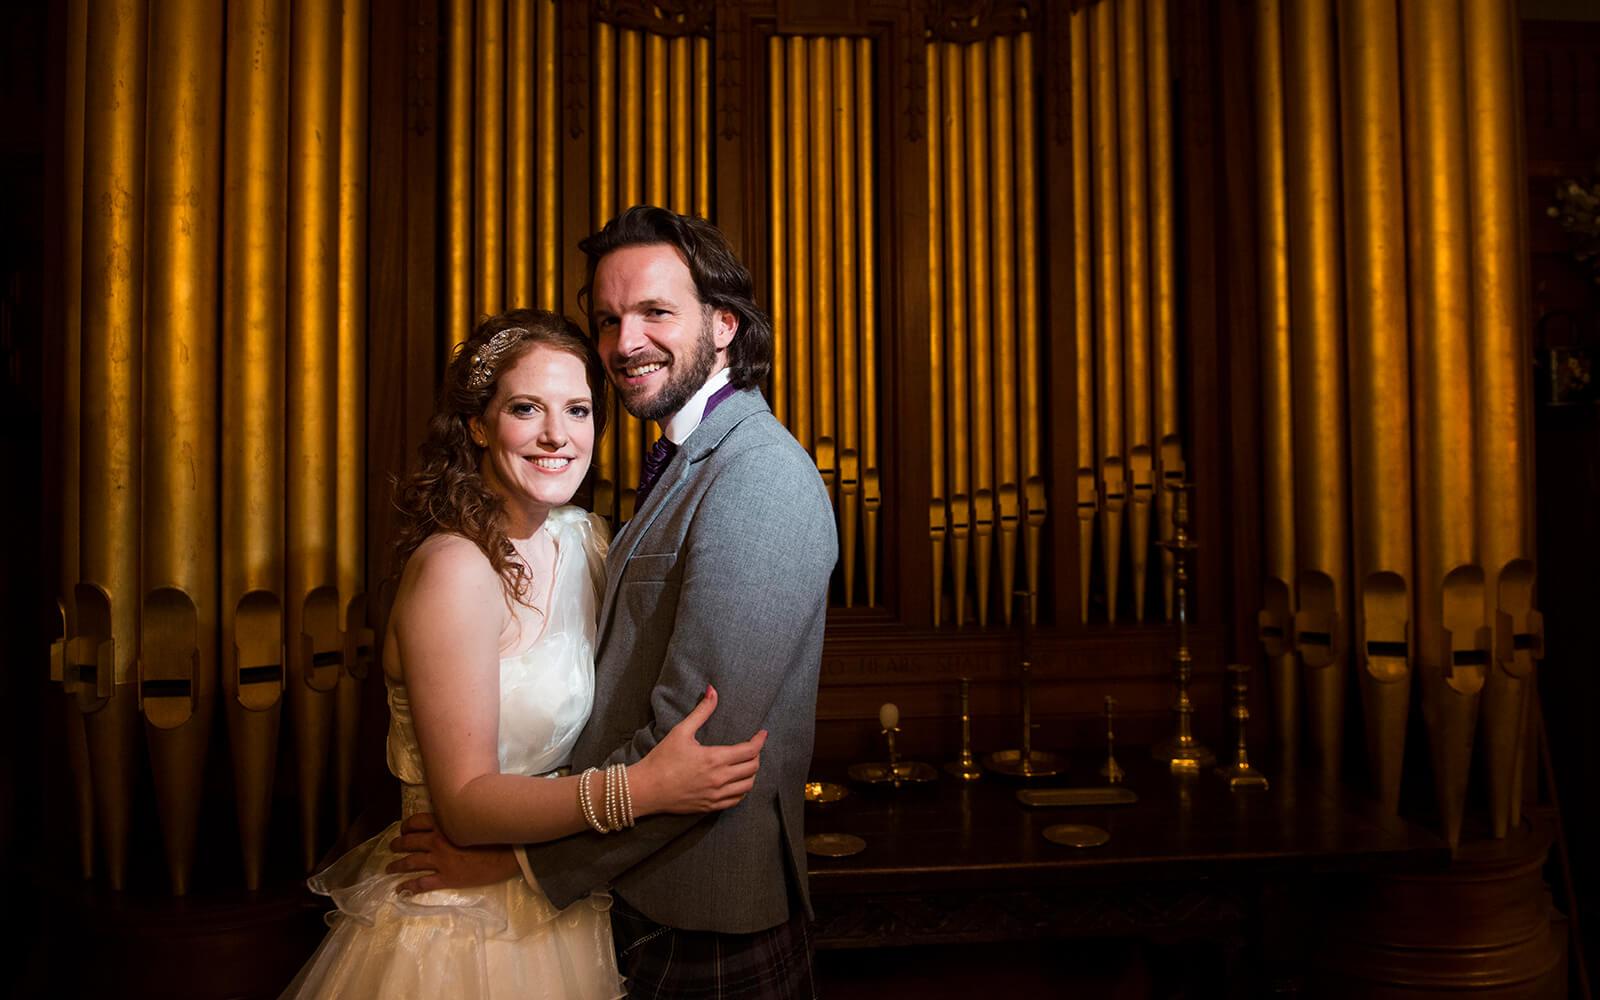 sorn castle wedding venue photographer